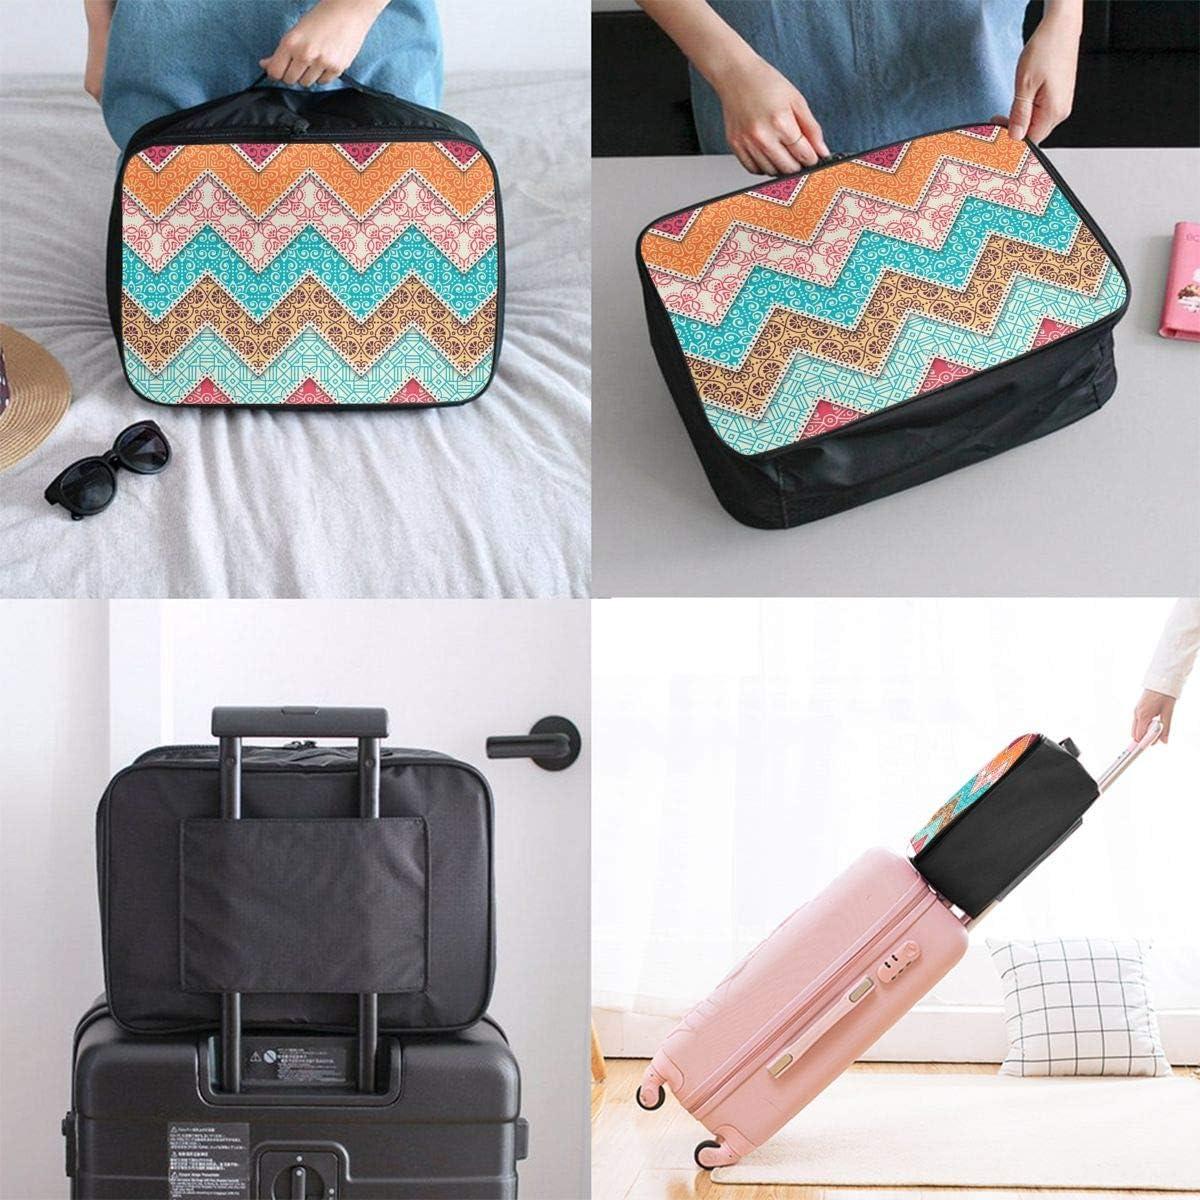 Geometric Fringes Wave Travel Carry-on Luggage Weekender Bag Overnight Tote Flight Duffel In Trolley Handle